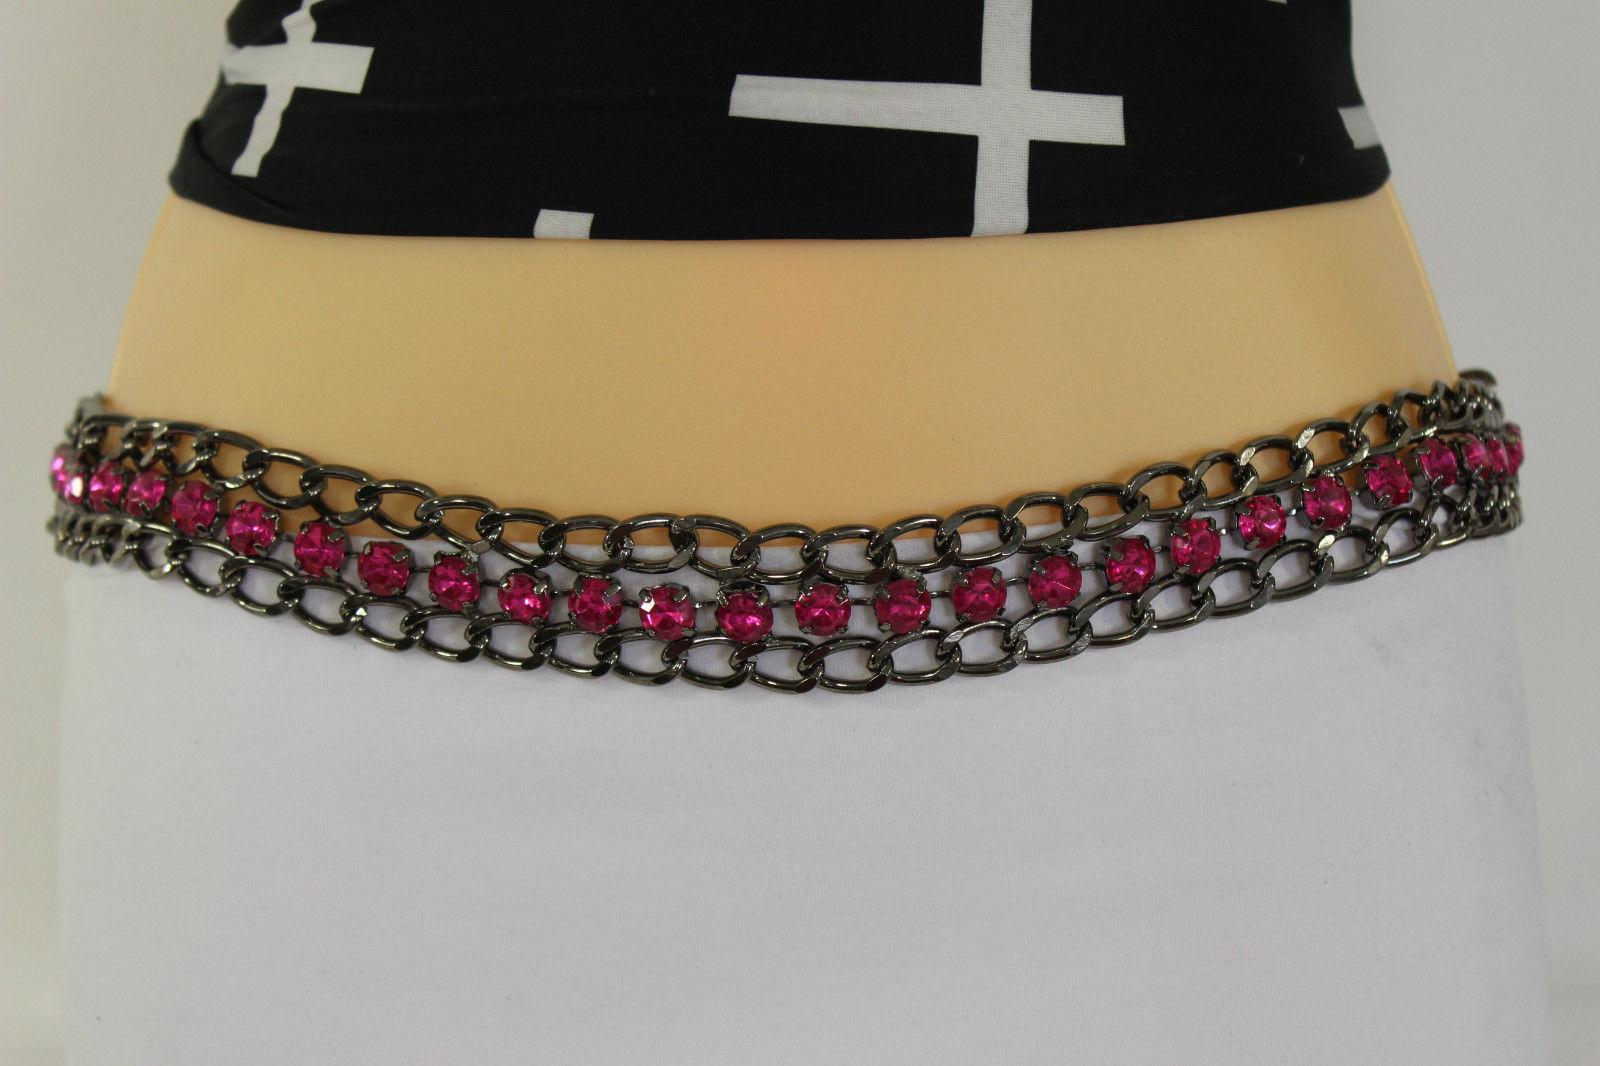 New Women Tie Fabric Belt Black Red Blue Hip Waist Chains Big Rhinestones S M L